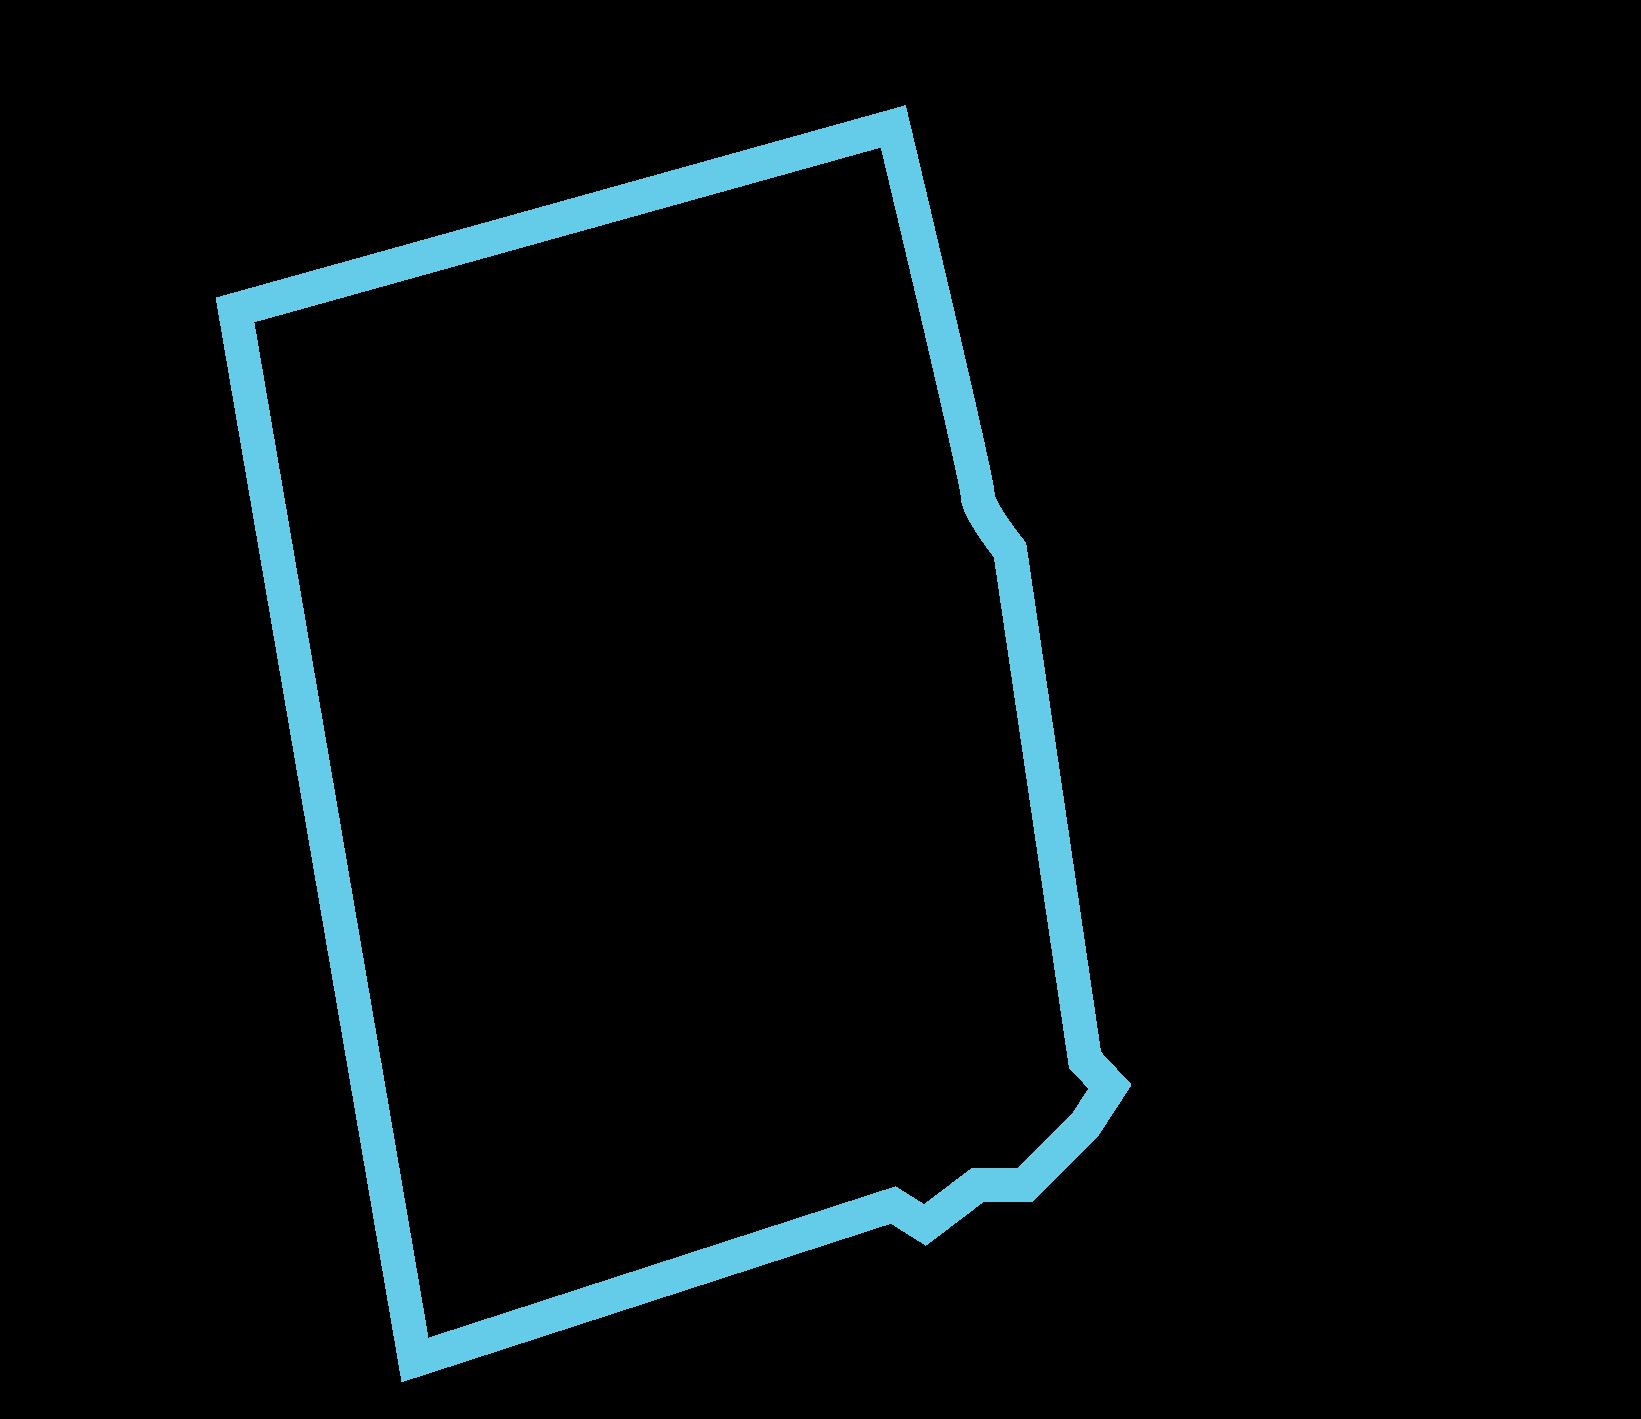 image of boundaries for Social Work